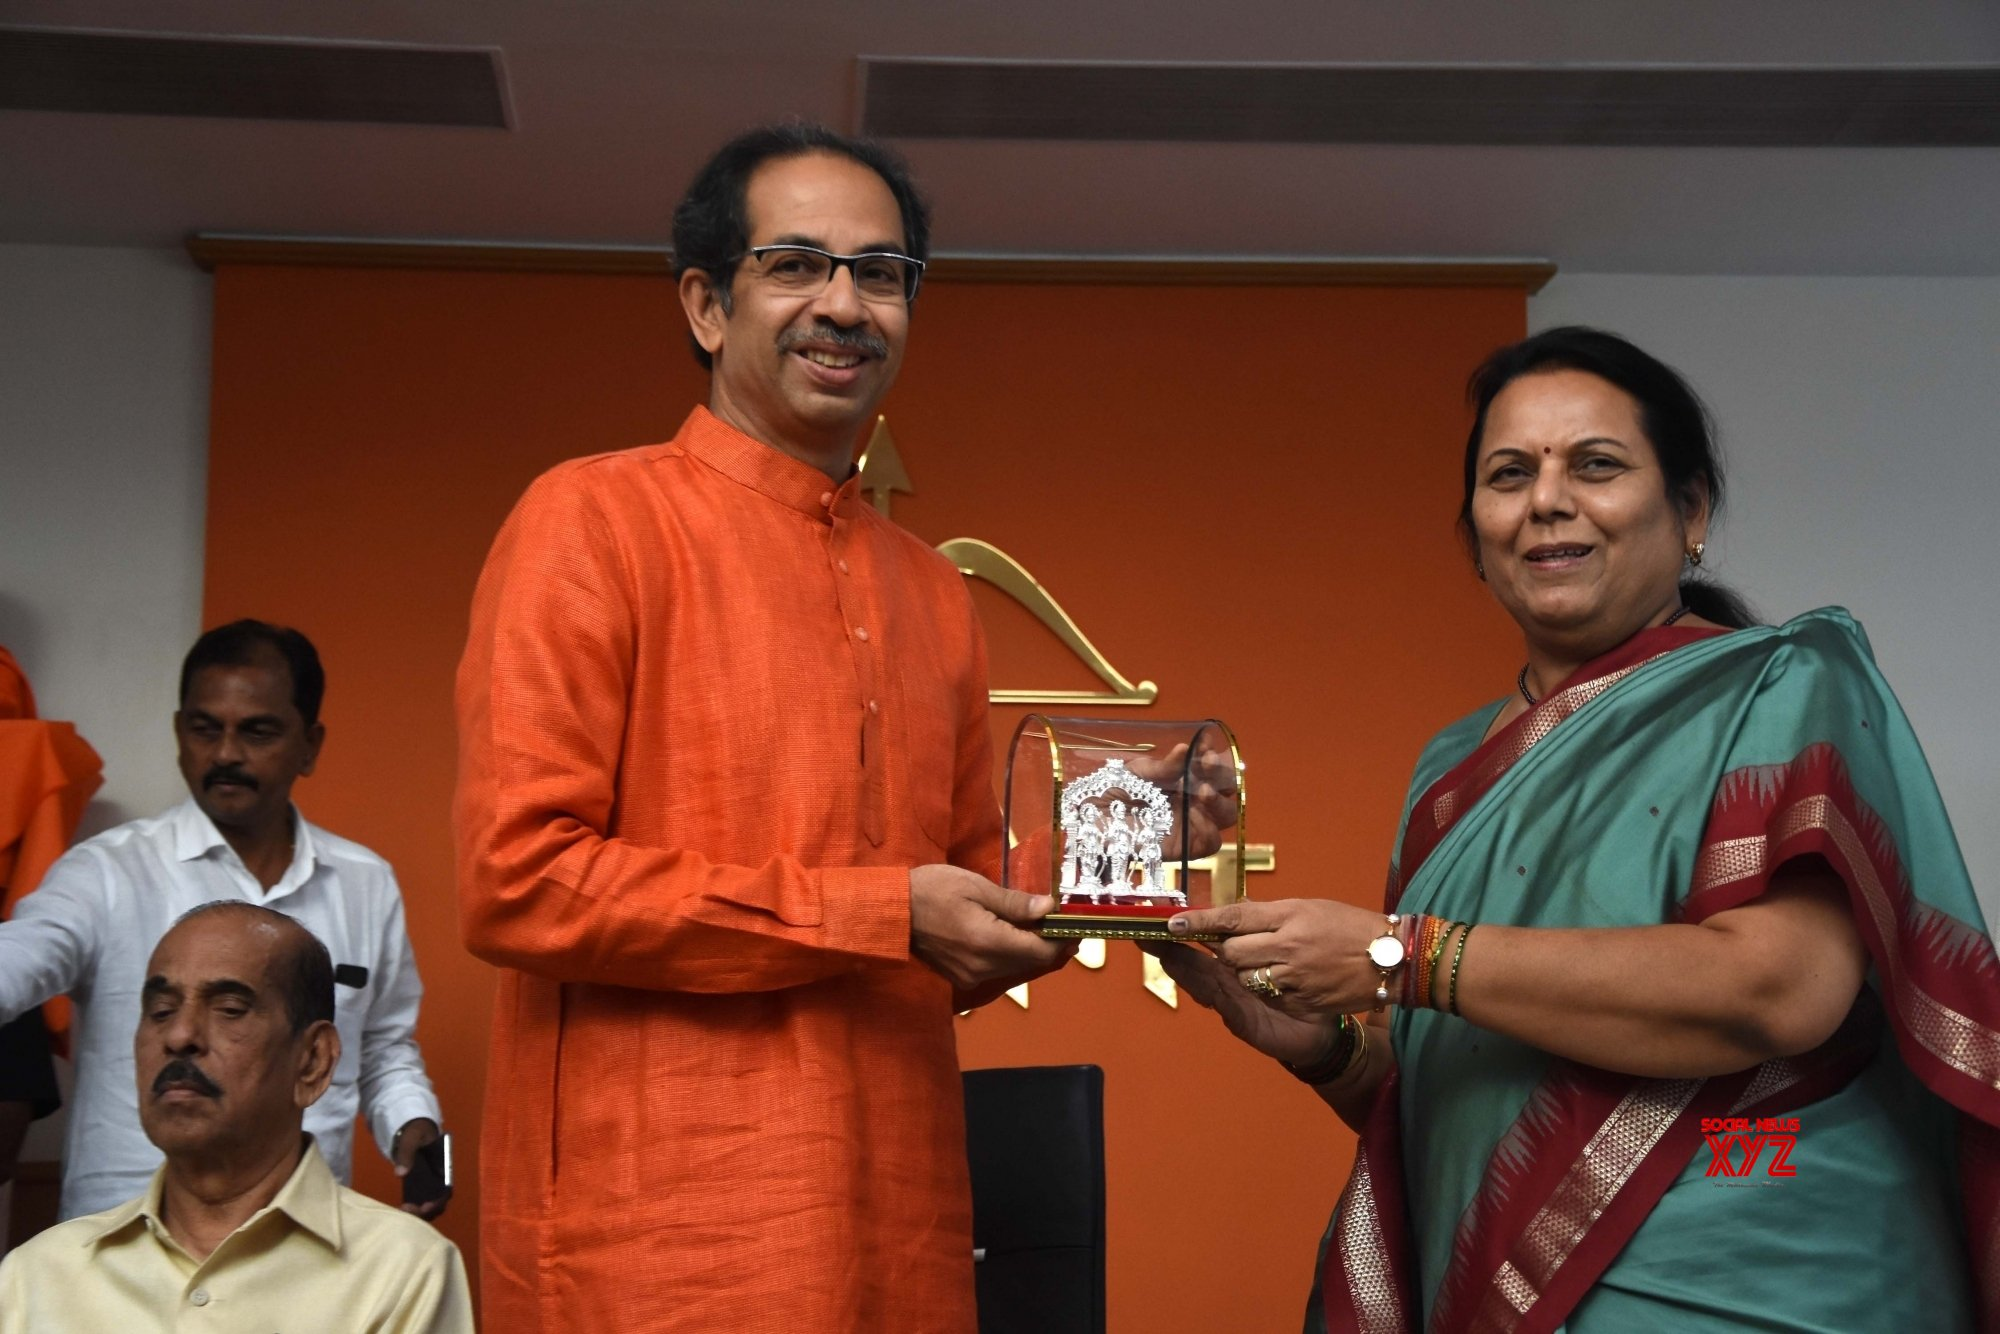 Mumbai: Uddhav Thackeray's press conference on SC's Ayodhya verdict #Gallery